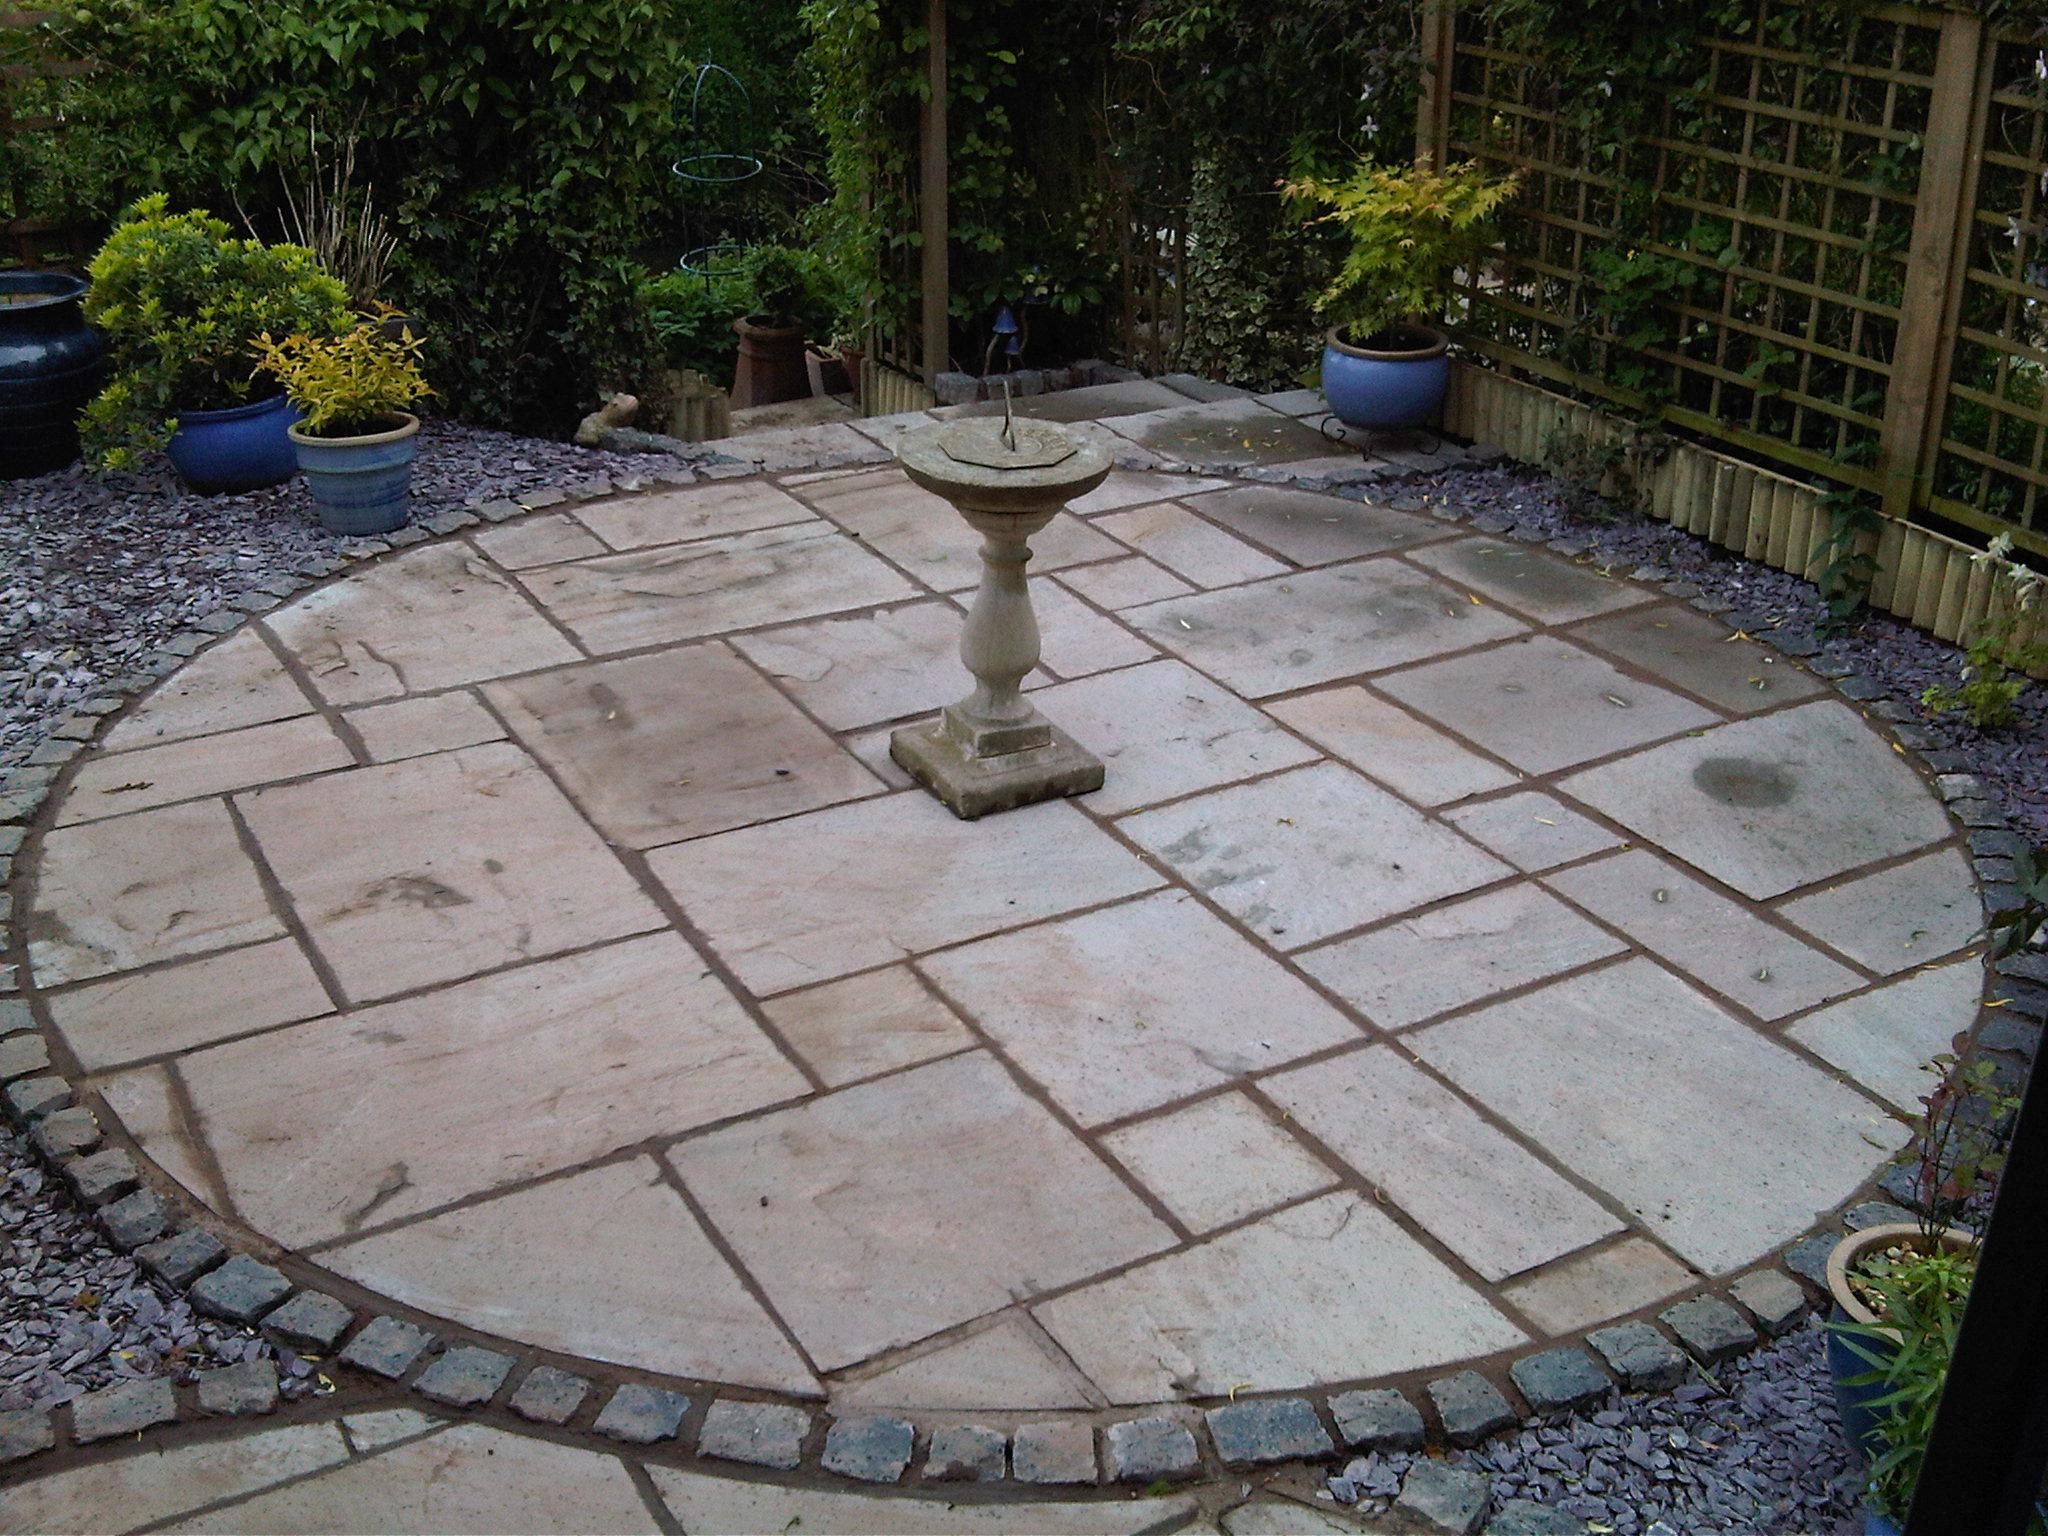 Natural stone paving with granite sett edging - Kinver, West Midlands